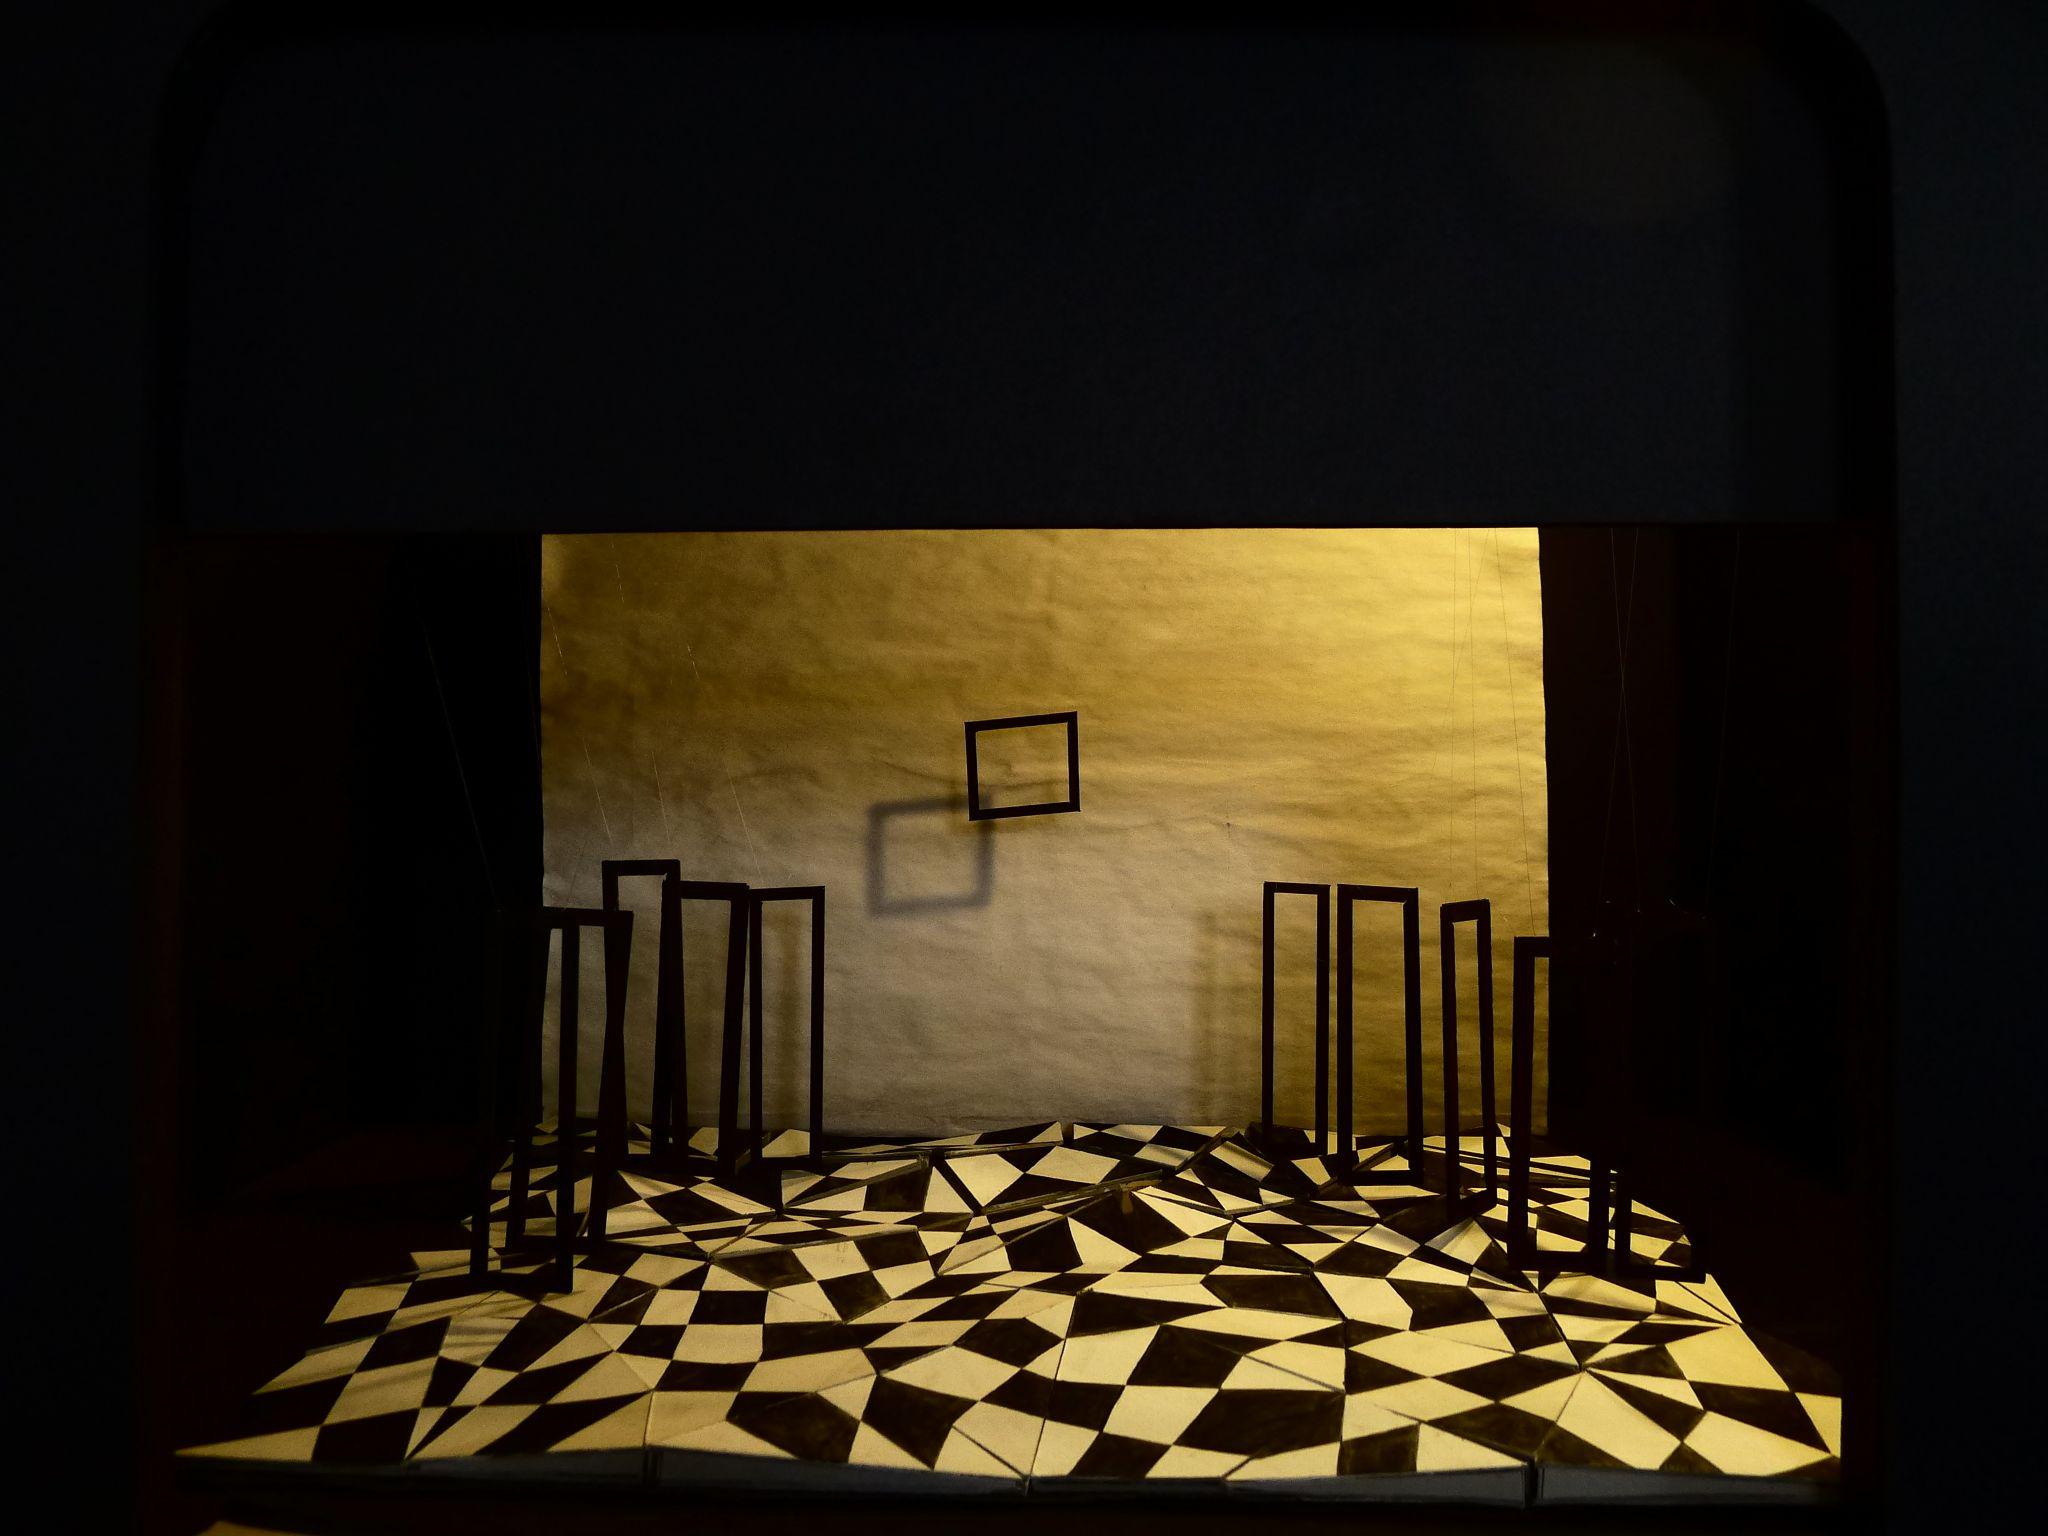 abstract scenic design - Google Search | Escenarios y ... Theatre Stage Layout